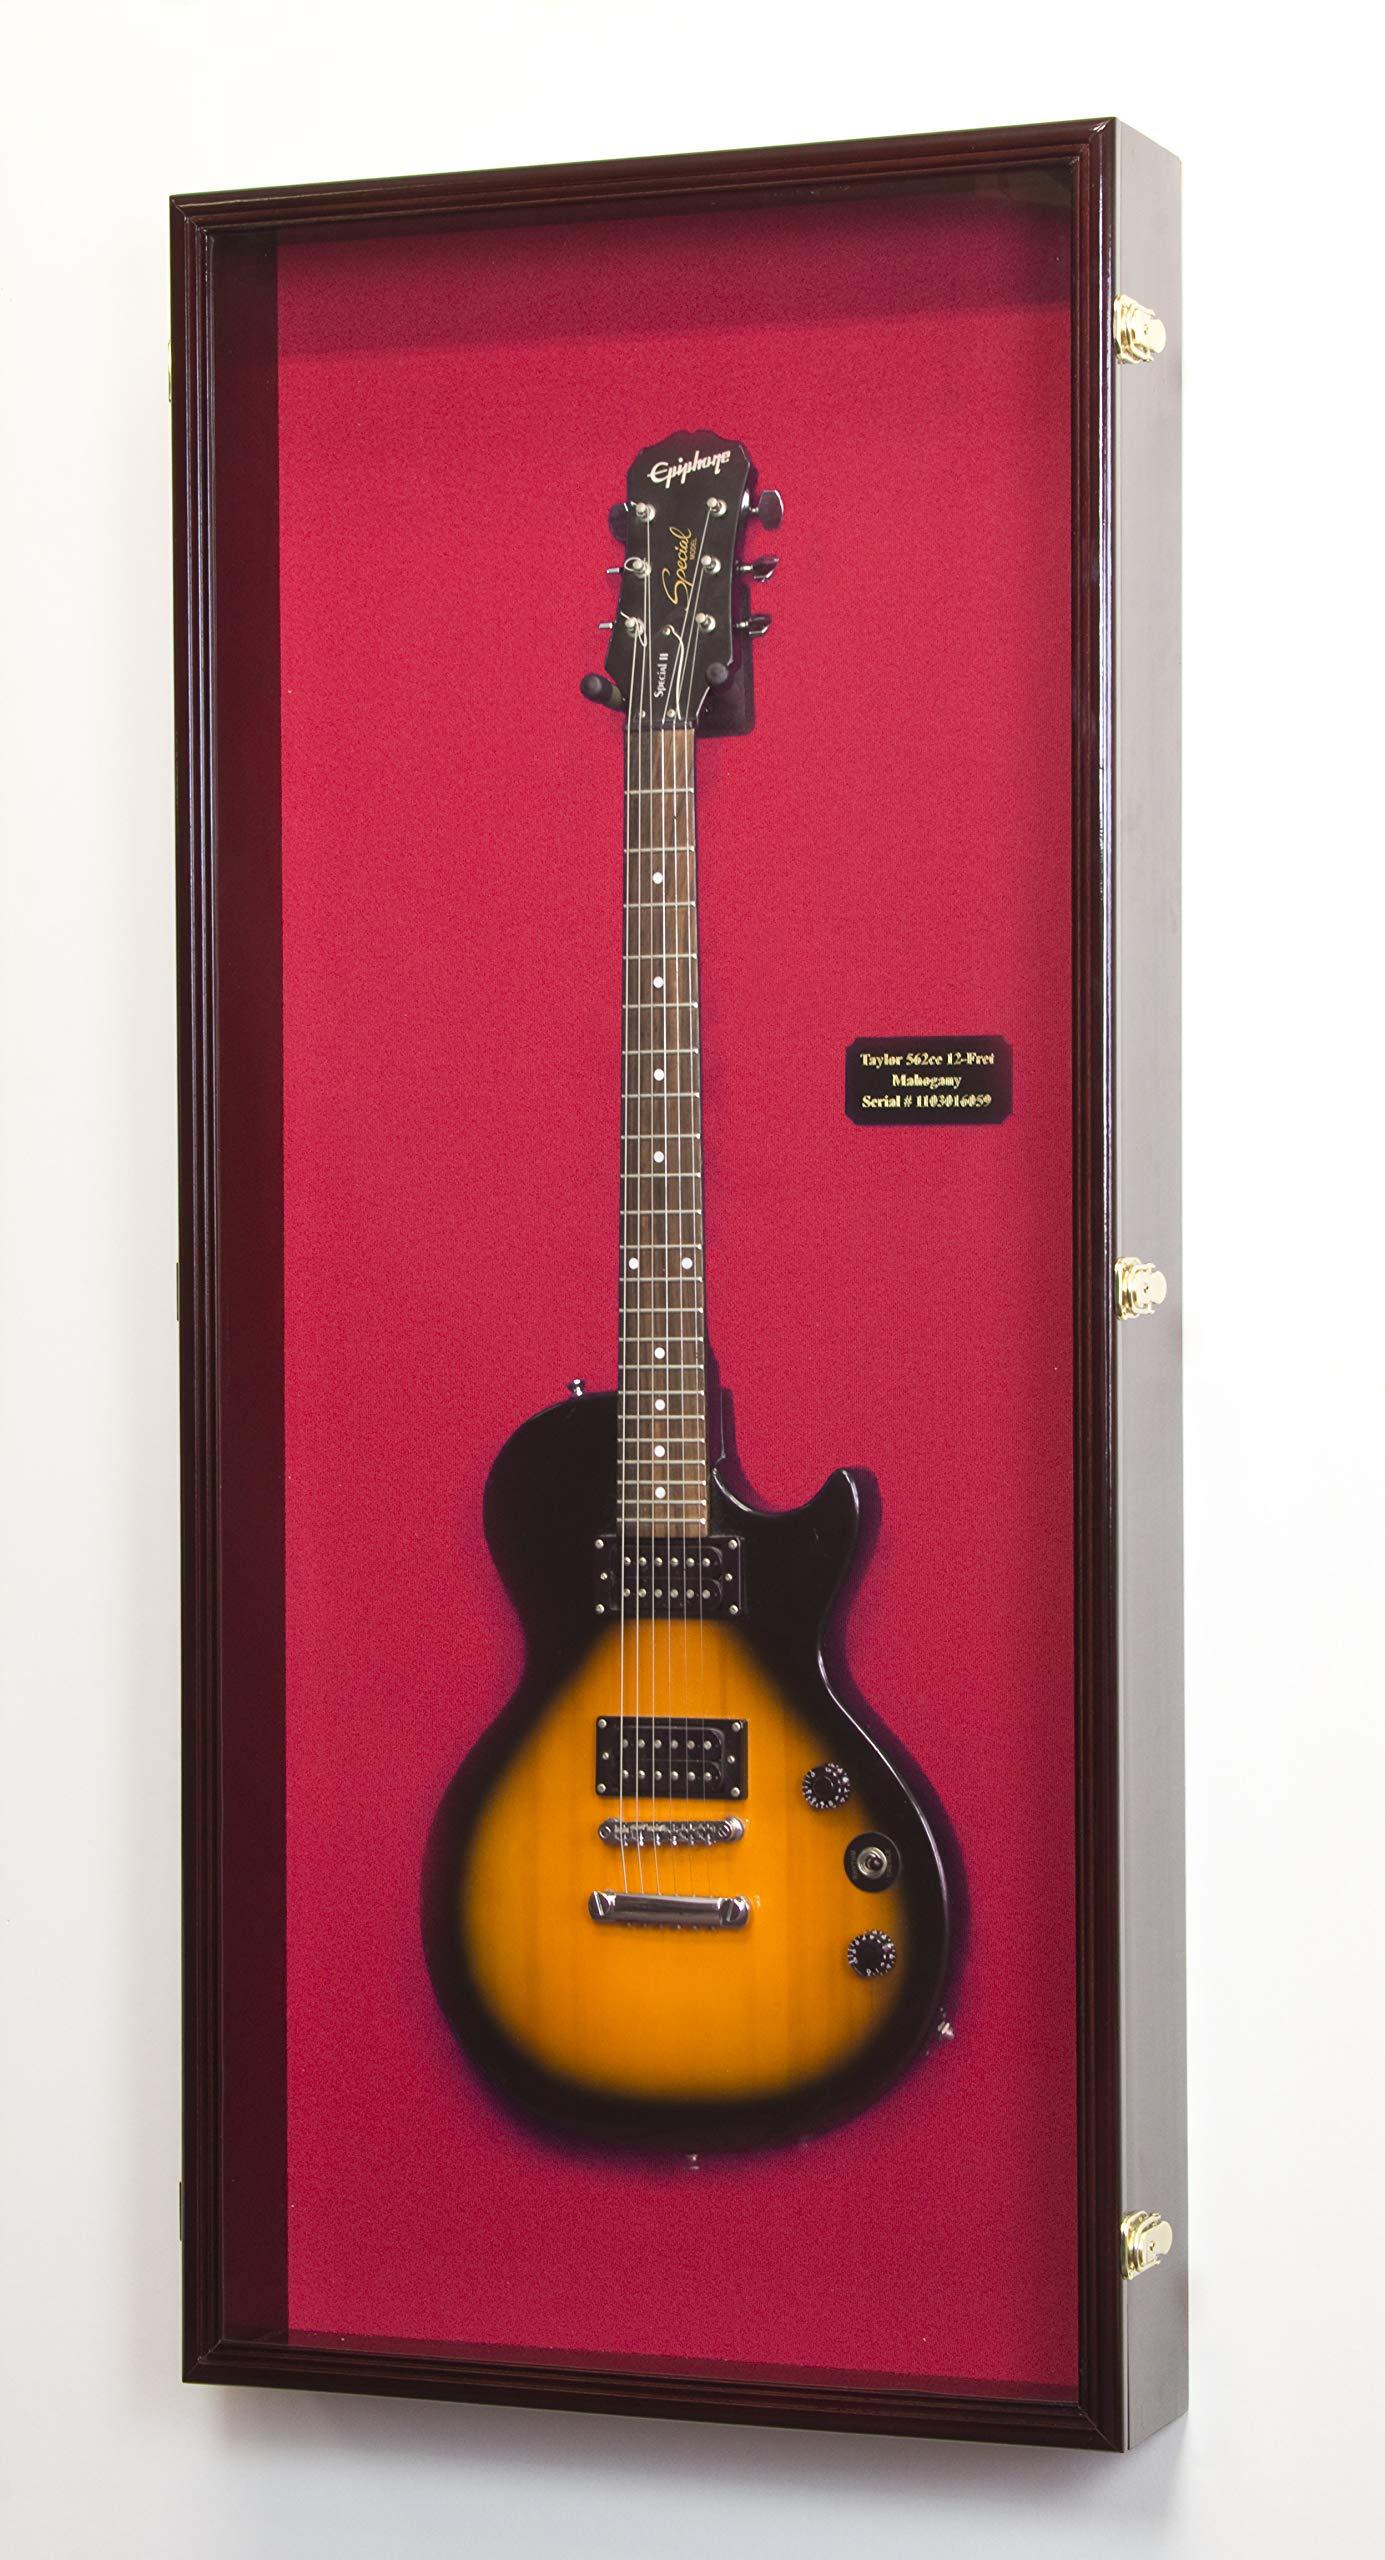 sfDisplay.com,LLC. Electric Bass Fender Guitar Display Case Cabinet Wall Rack Holder 98% UV Lockable 50x22'' (Cherry Wood Finish, Red Felt Background) by sfDisplay.com,LLC.